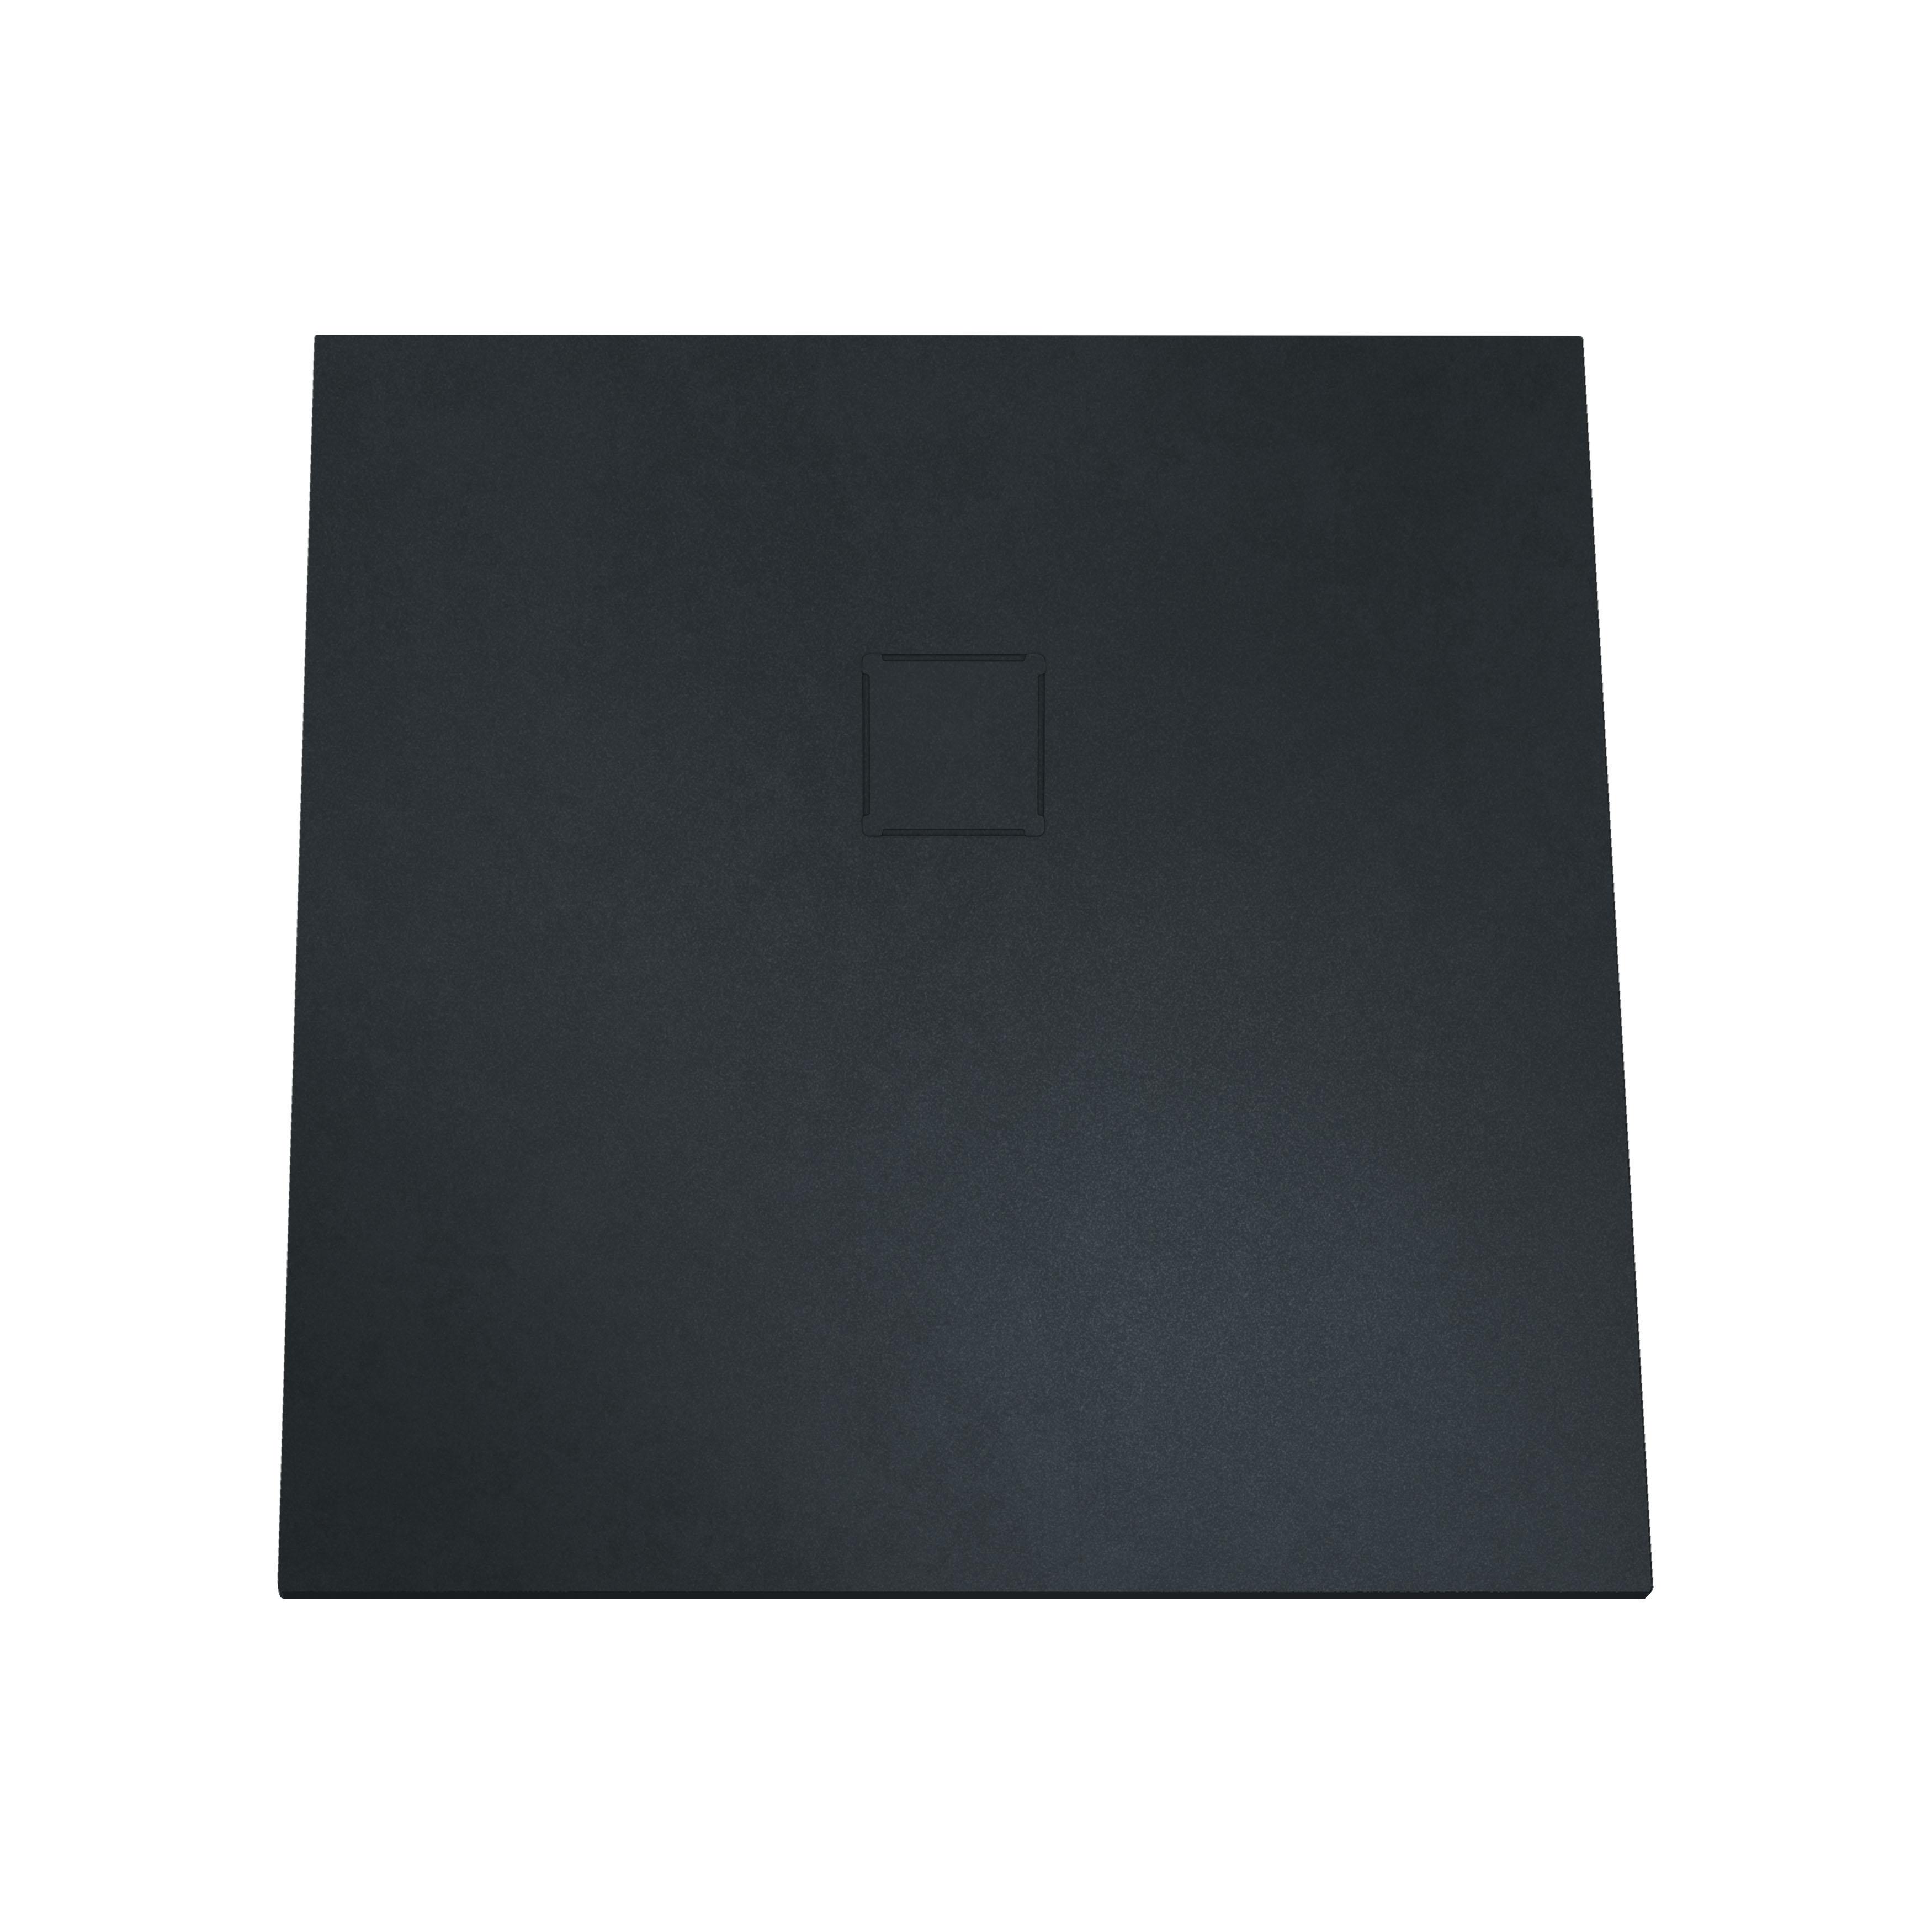 V-stone, receveur ultra plat en solid stone, 90 cm, anthraciteacite